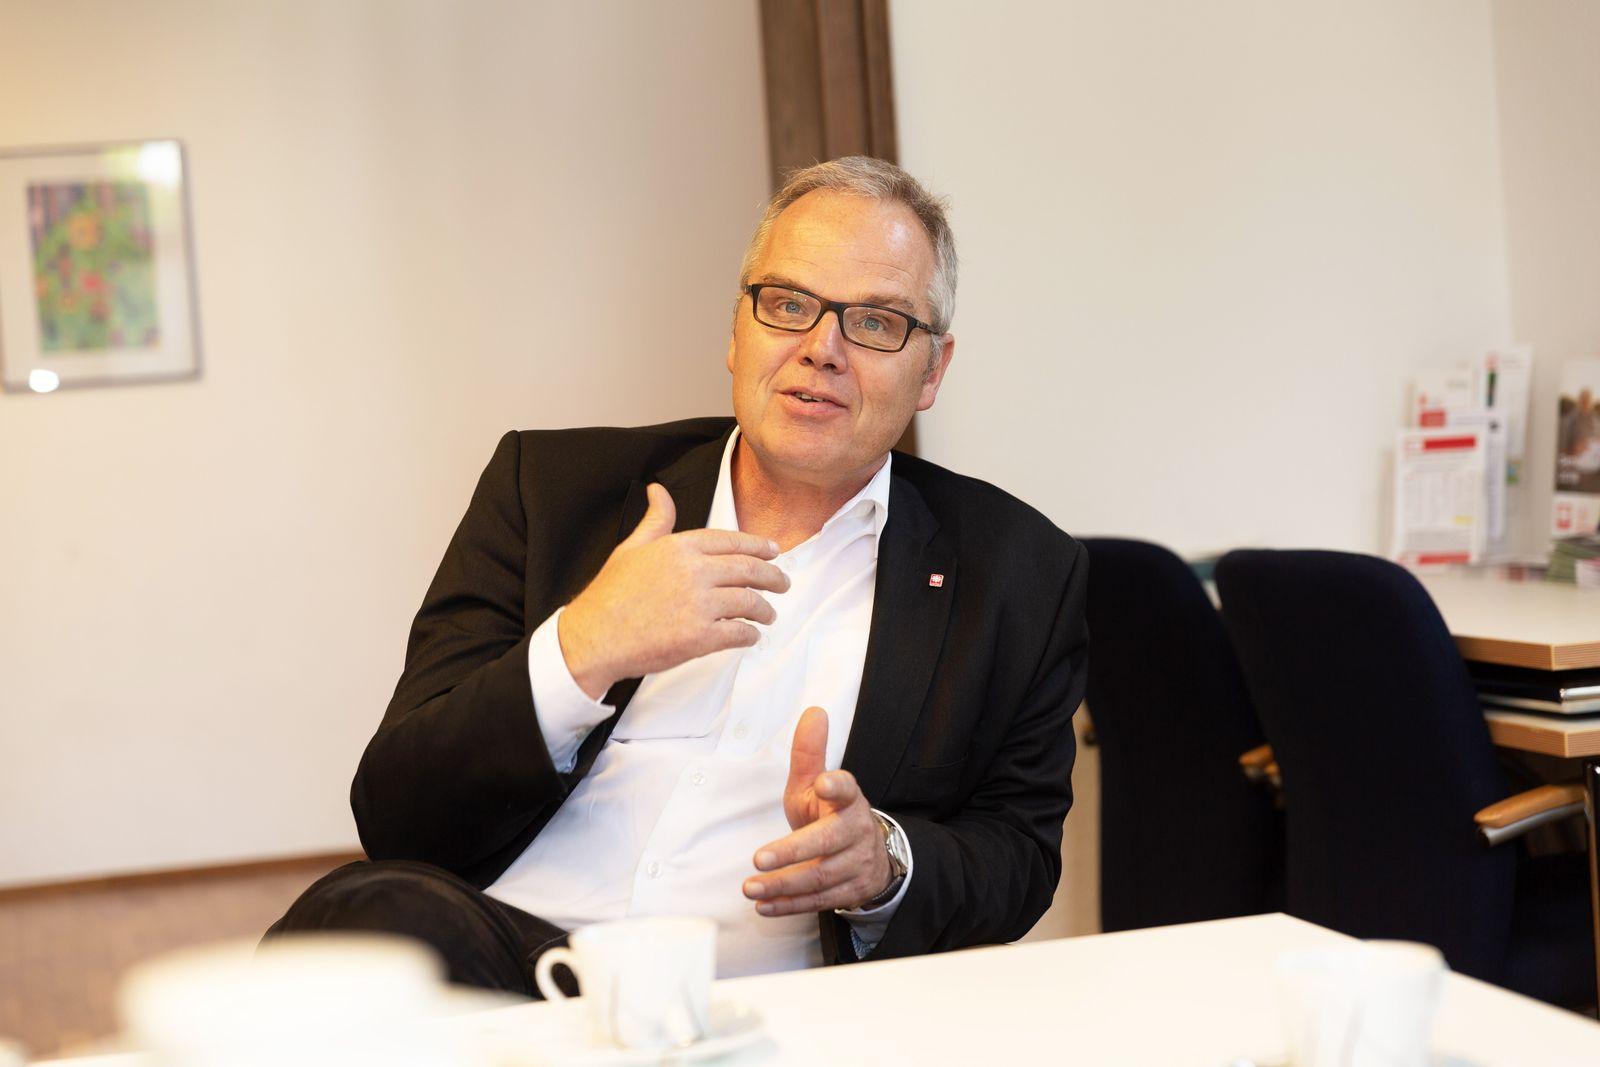 Caritas Brinkhaus/ Volker Brüggenjürgen